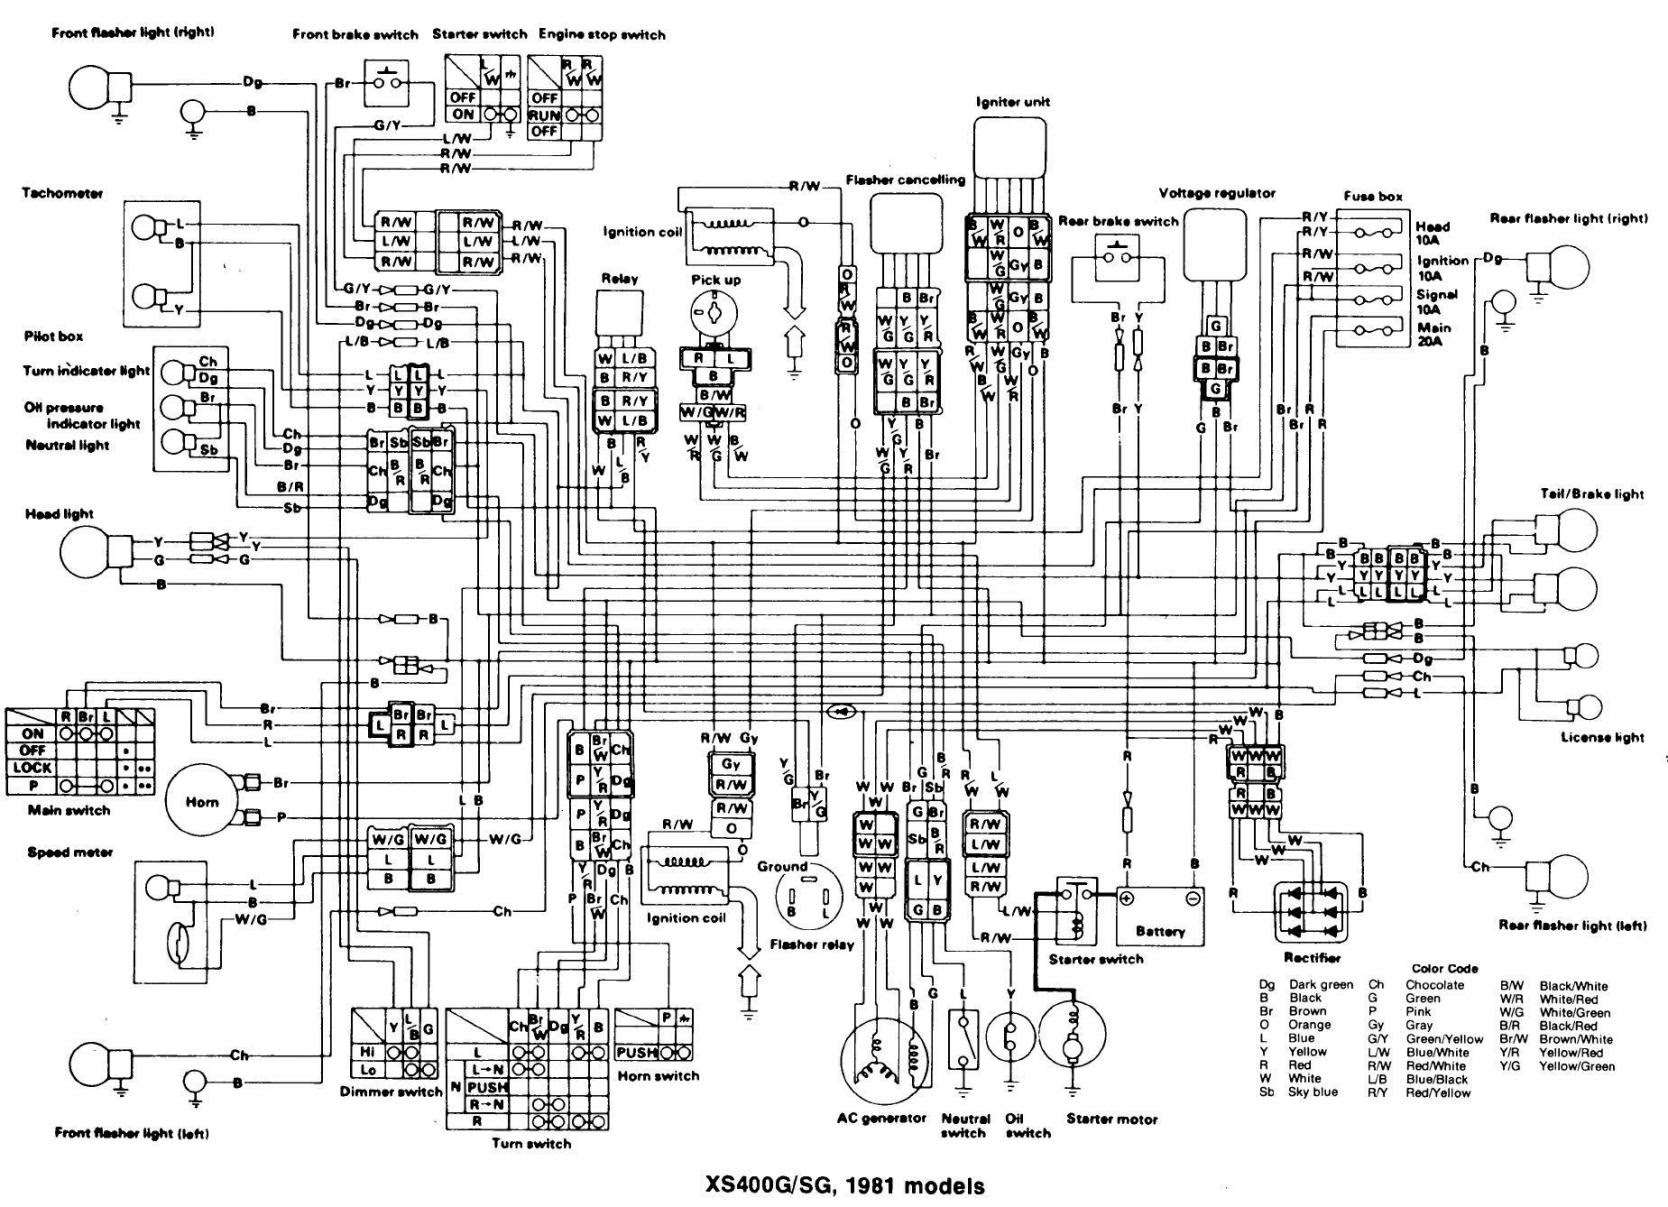 Diagram Yamaha Maxim 650 Chopper Wiring Diagrams Full Version Hd Quality Wiring Diagrams Newavewiring Archiviobici It